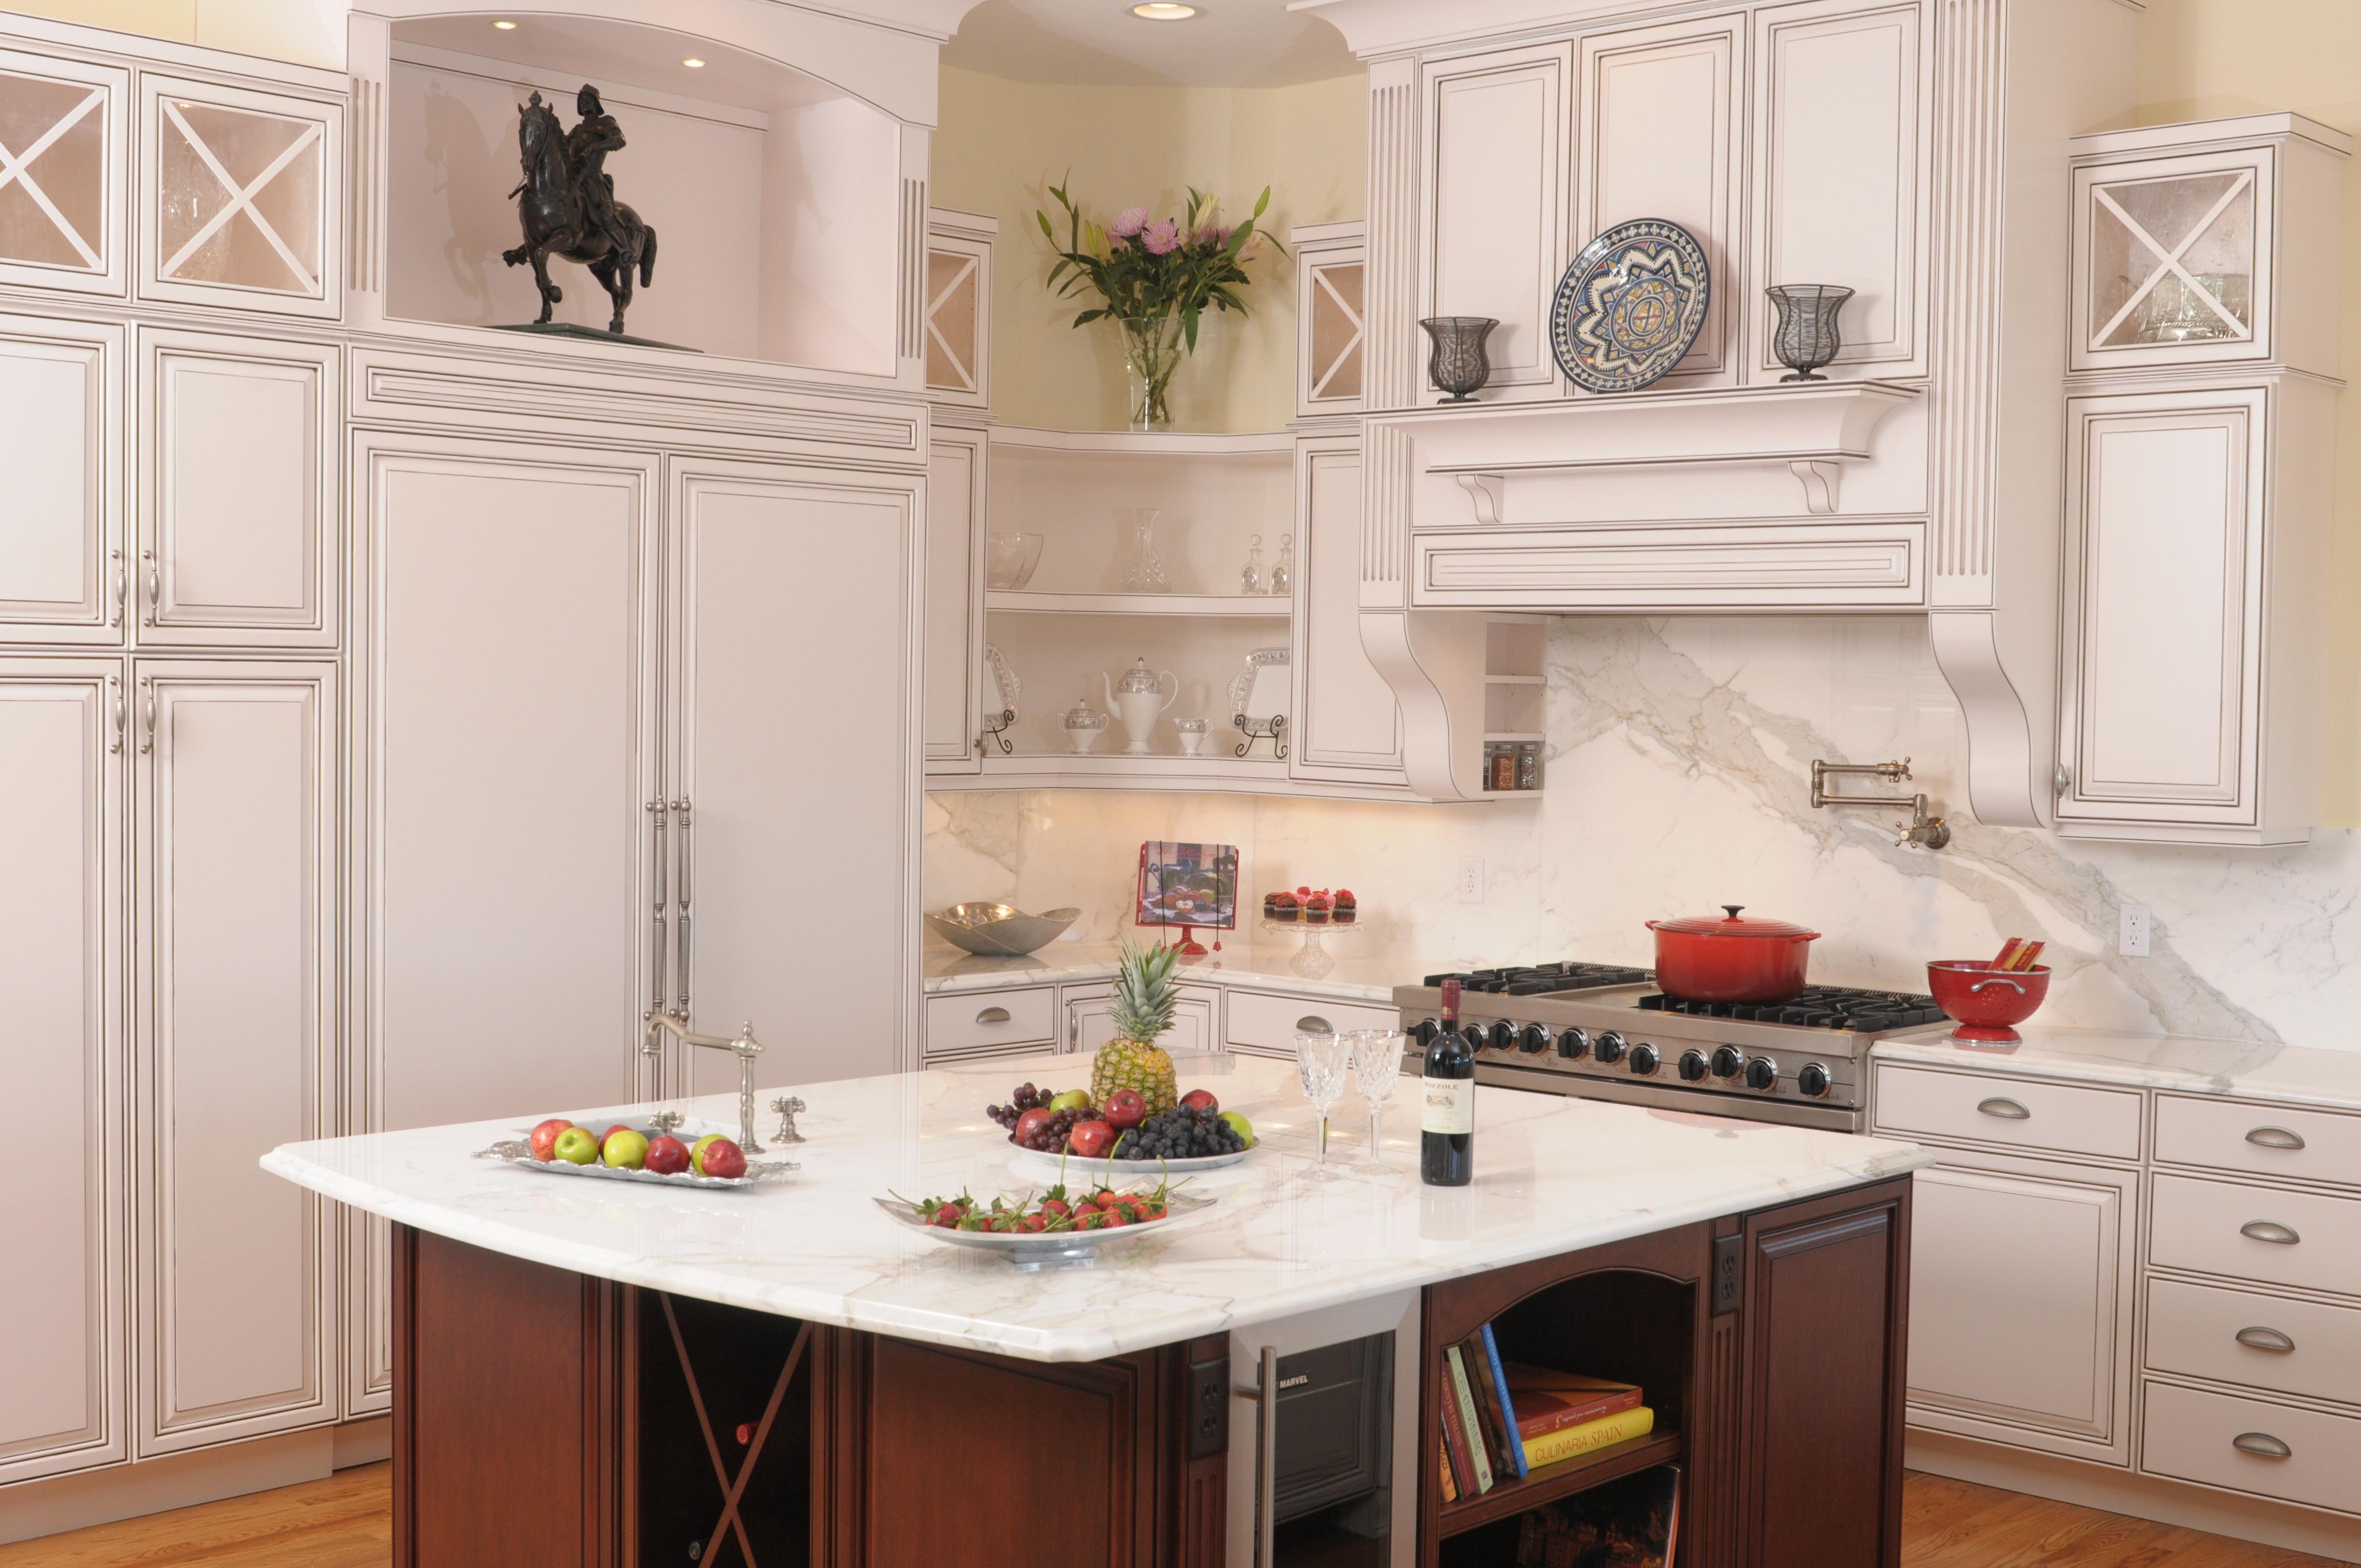 CS Kitchen Elegant Design Interior #1 Dons Custom Longmont and Boulder Countertops and Cabinets 02 12 09 CS Design Interiors 0044 -